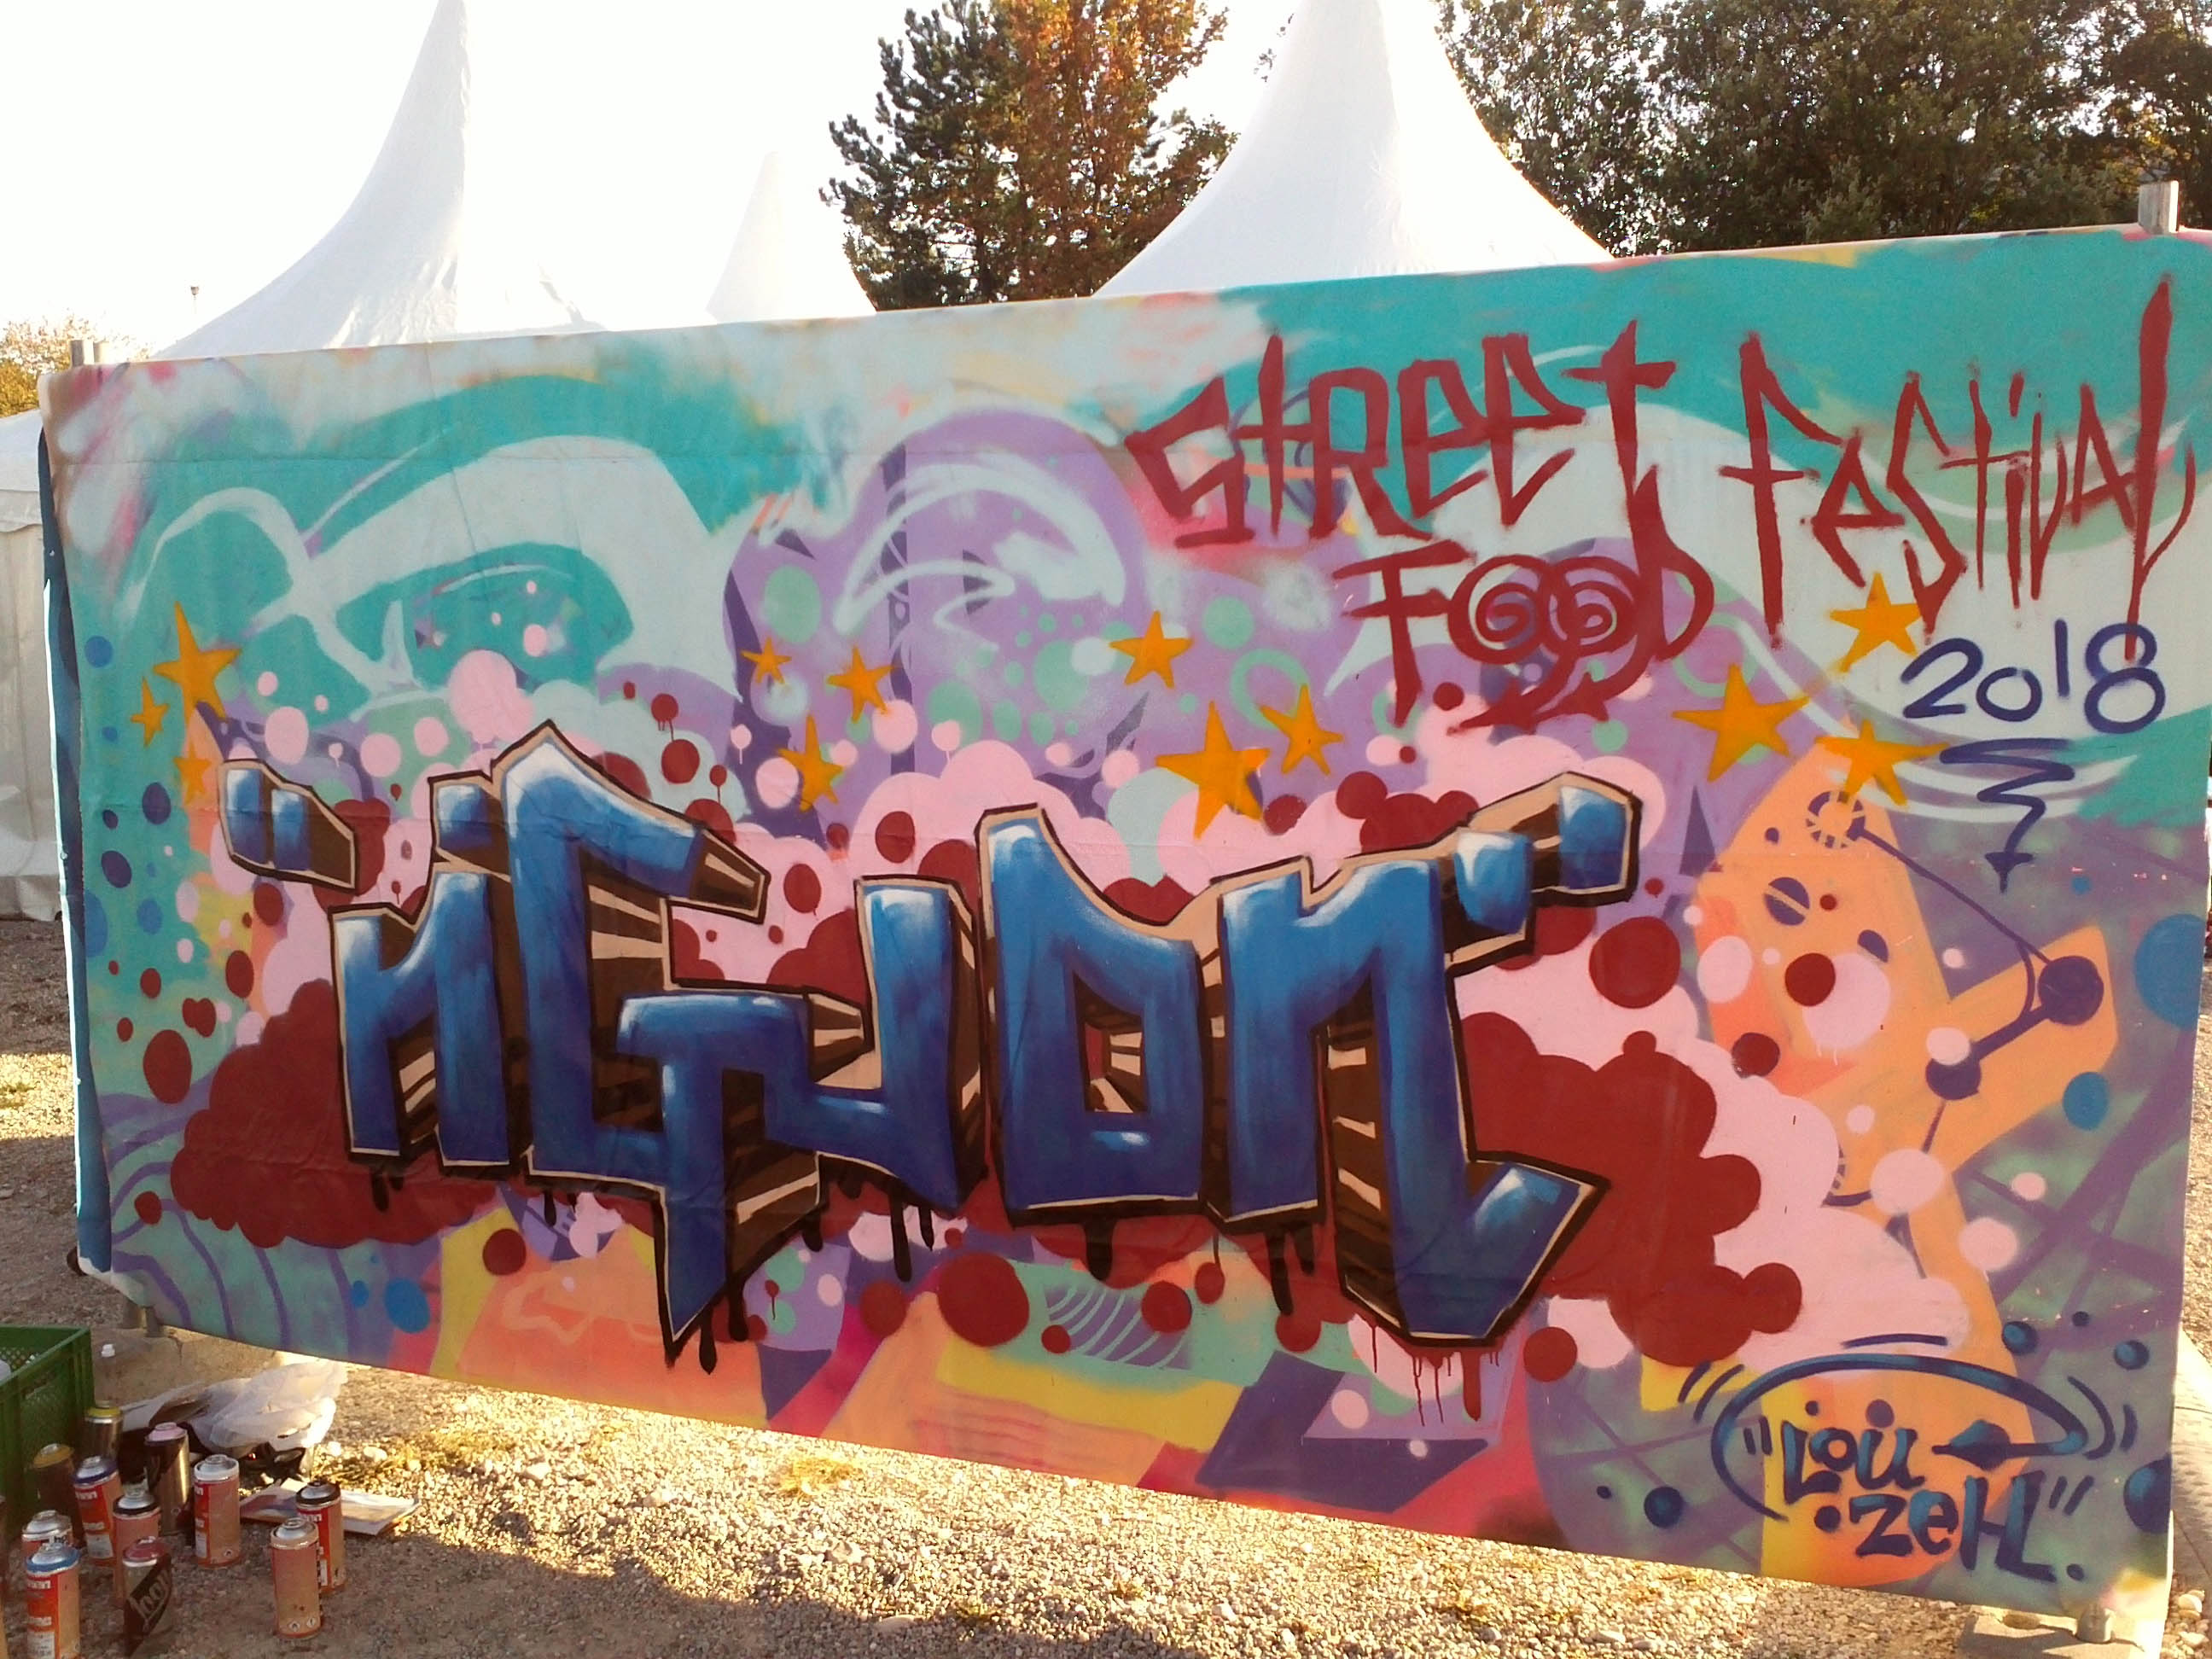 ngudn louzeh lou zeh graffiti